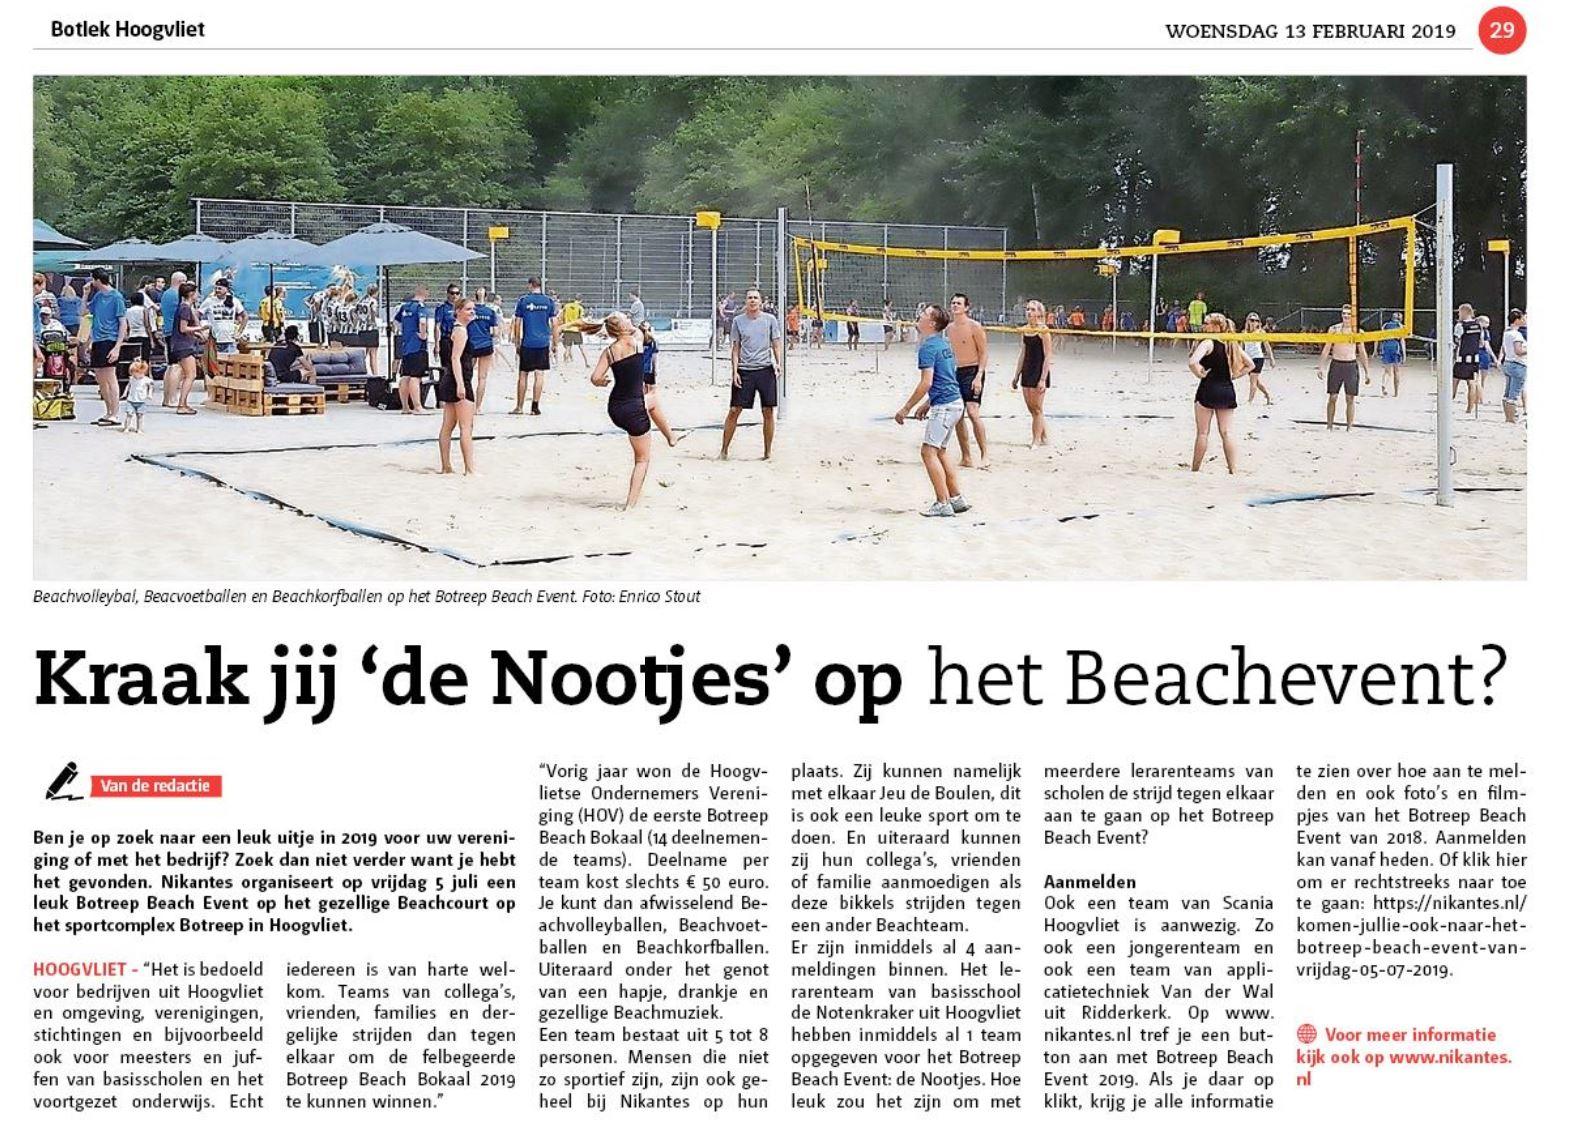 Botreep Beach Event In De Botlek Van Woensdag 13 02 2019